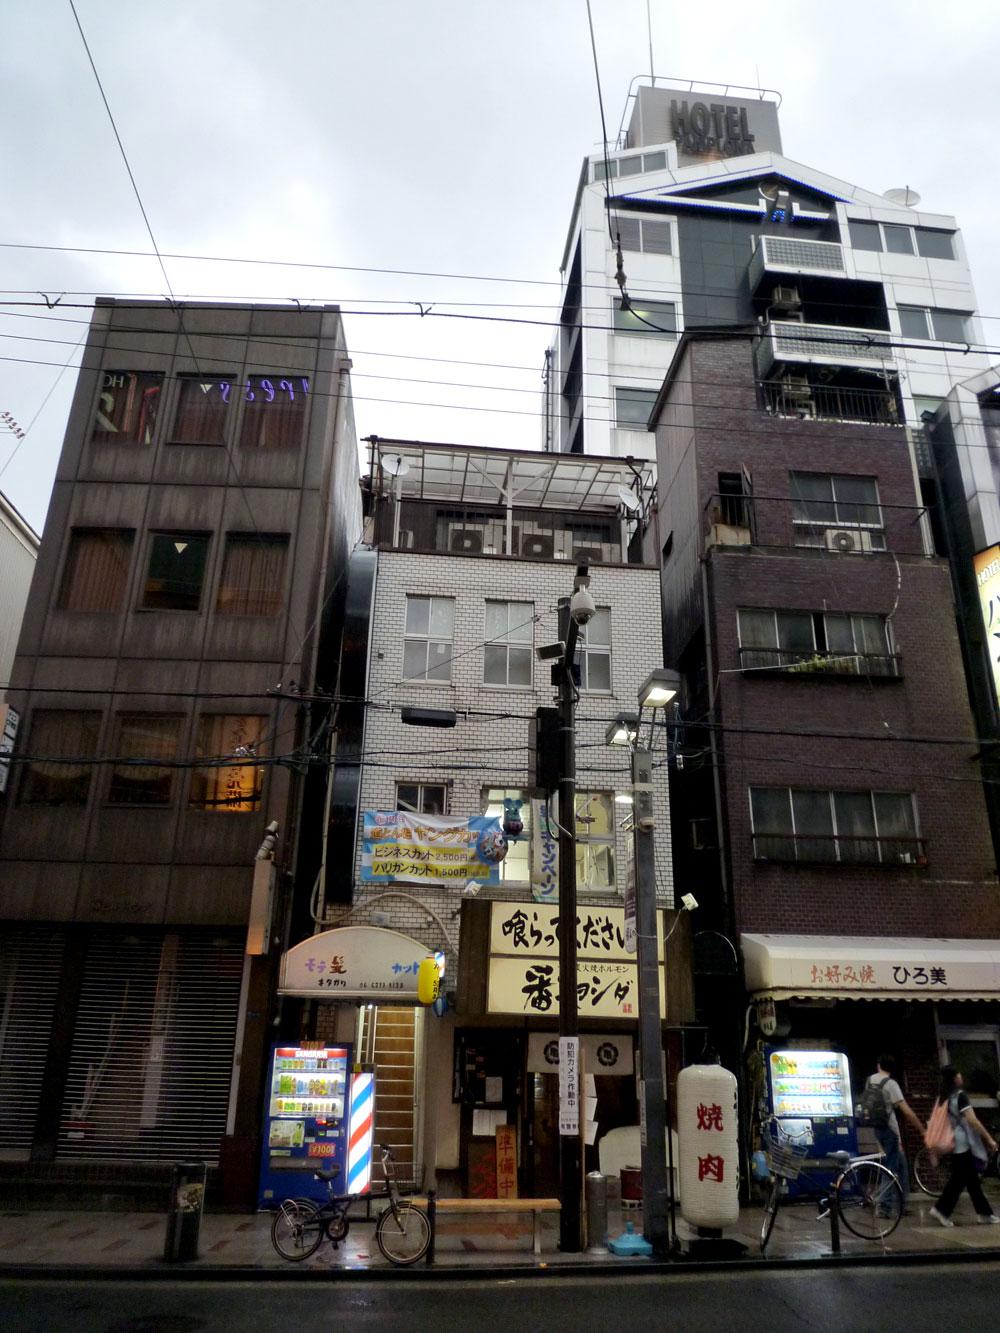 JapanByMicheleMoricci-Osaka#5